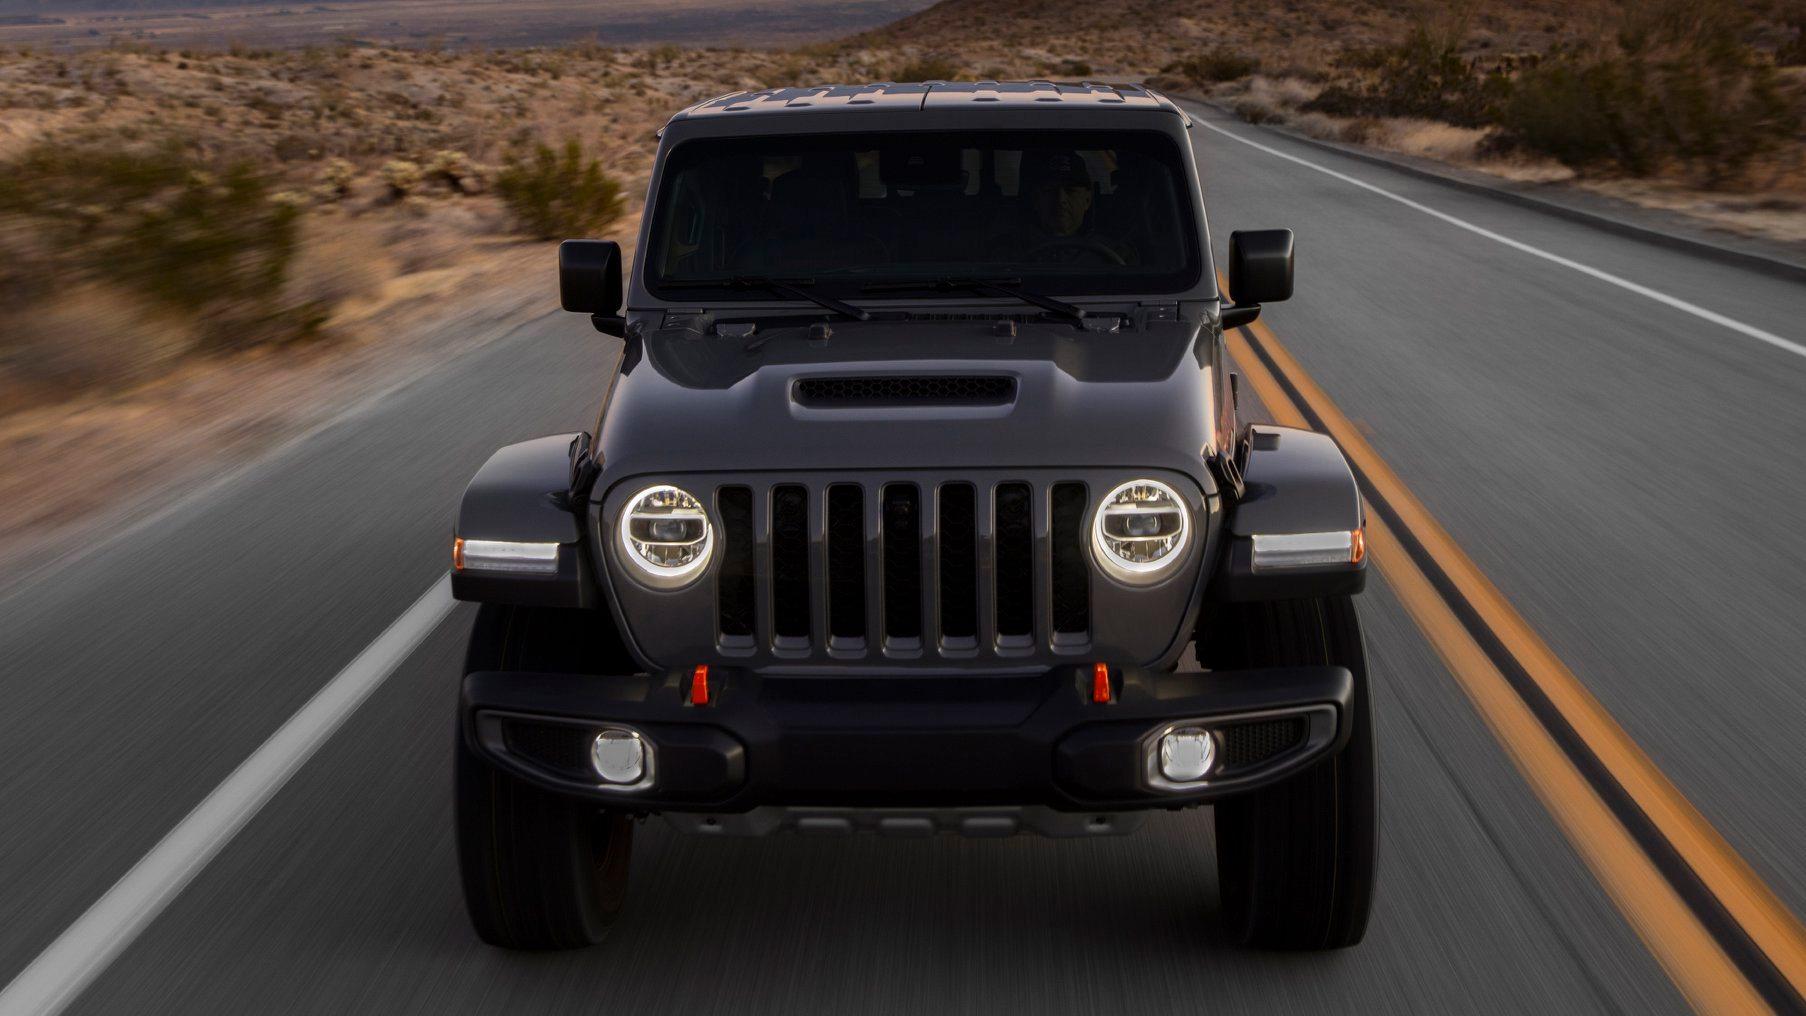 Jeep Gladiator Mojave Desert Rated 2020- highway